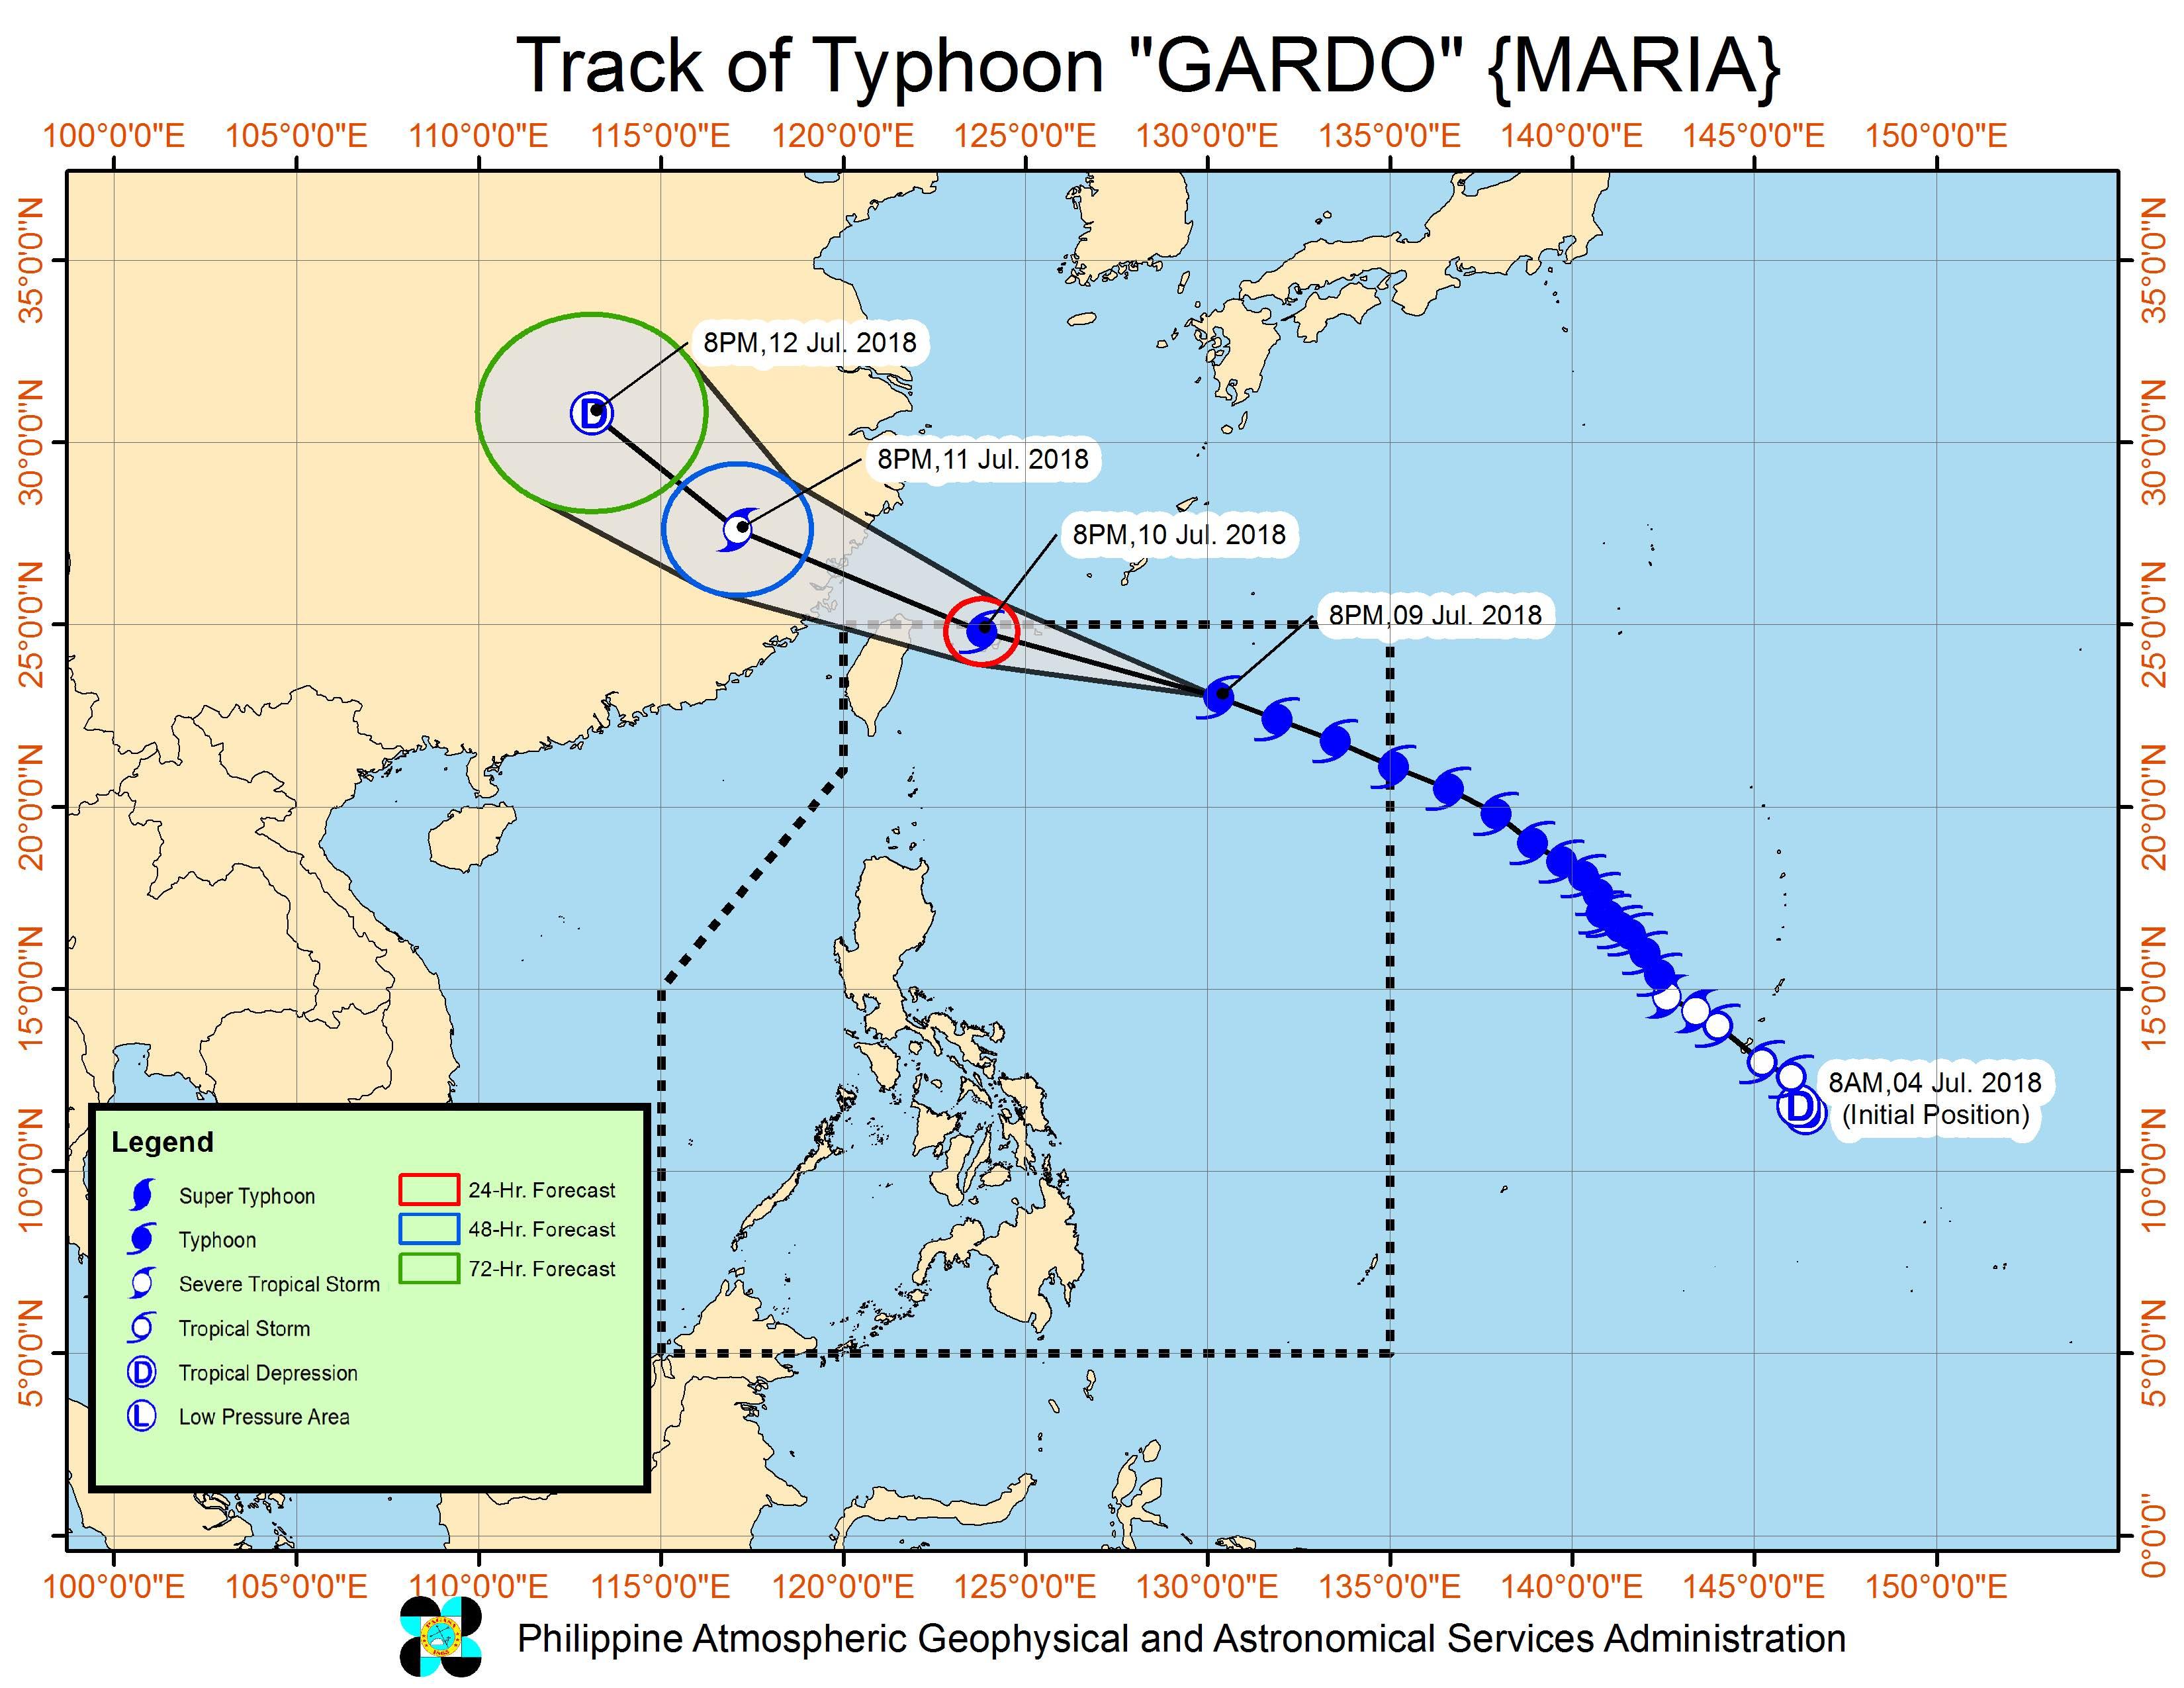 Forecast track of Typhoon Gardo (Maria) as of July 9, 2018, 11 pm. Image courtesy of PAGASA